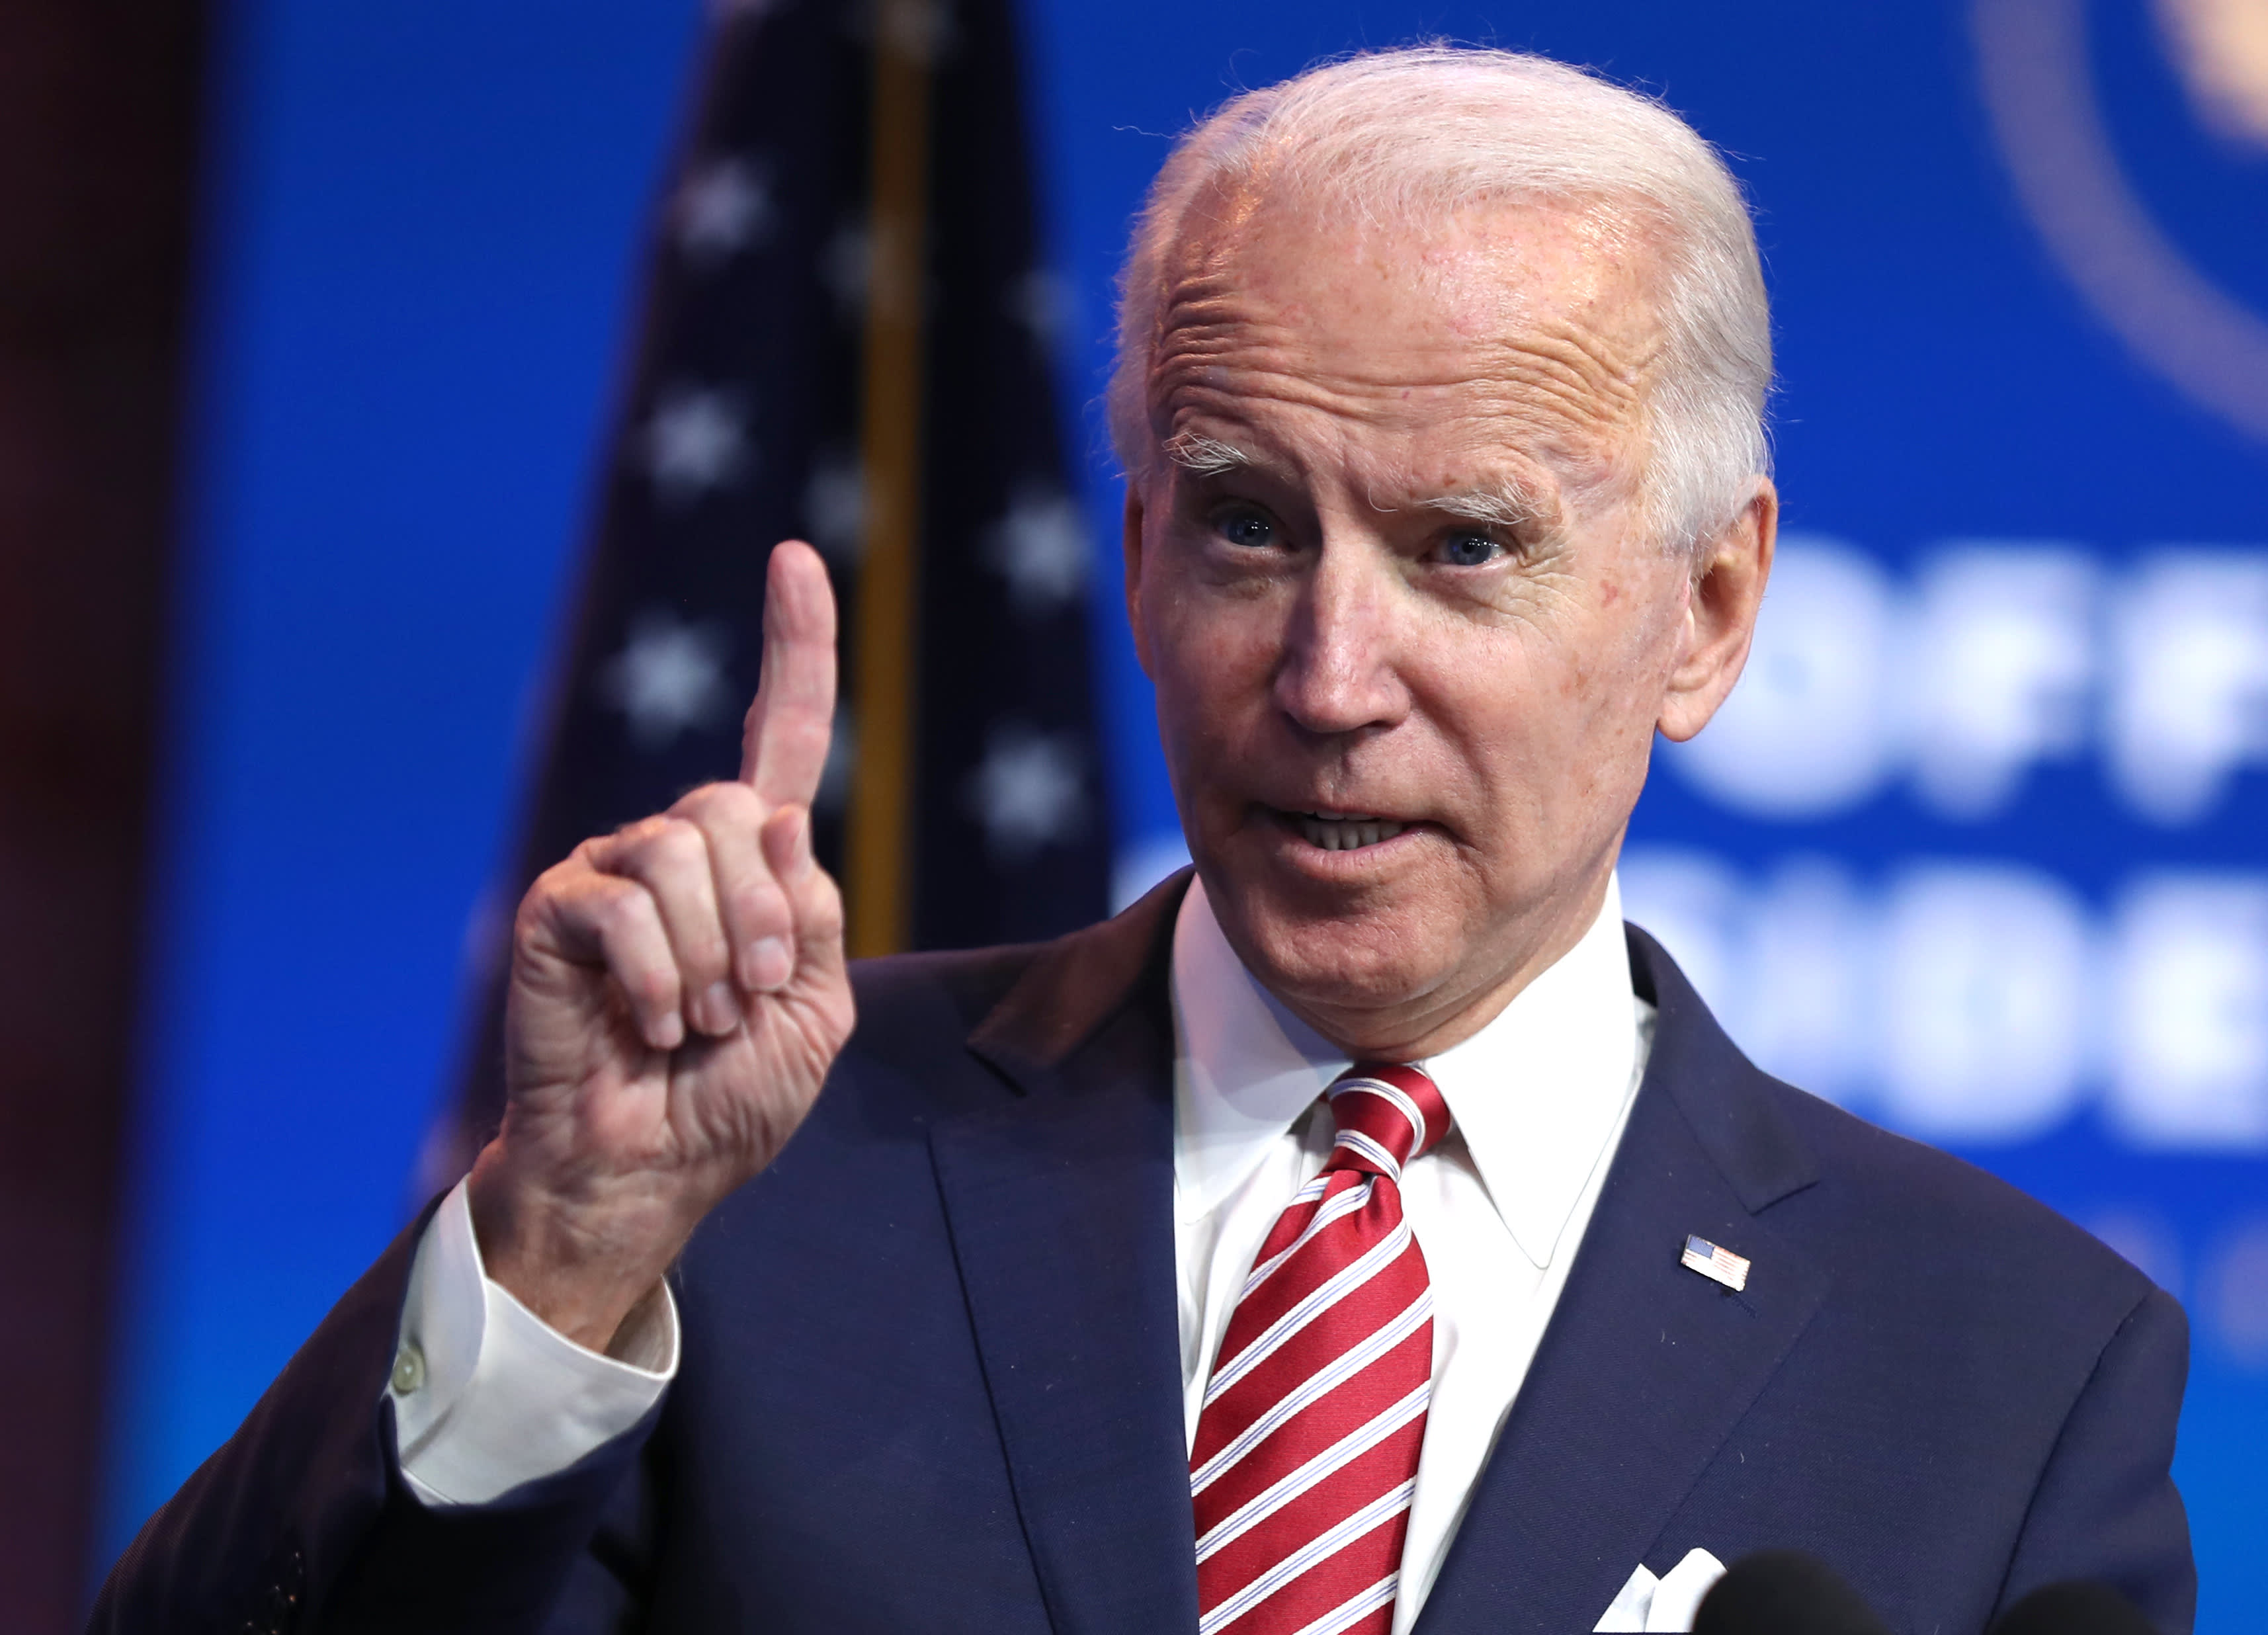 Biden announces economic team confirms Janet Yellen as Treasury nominee – CNBC